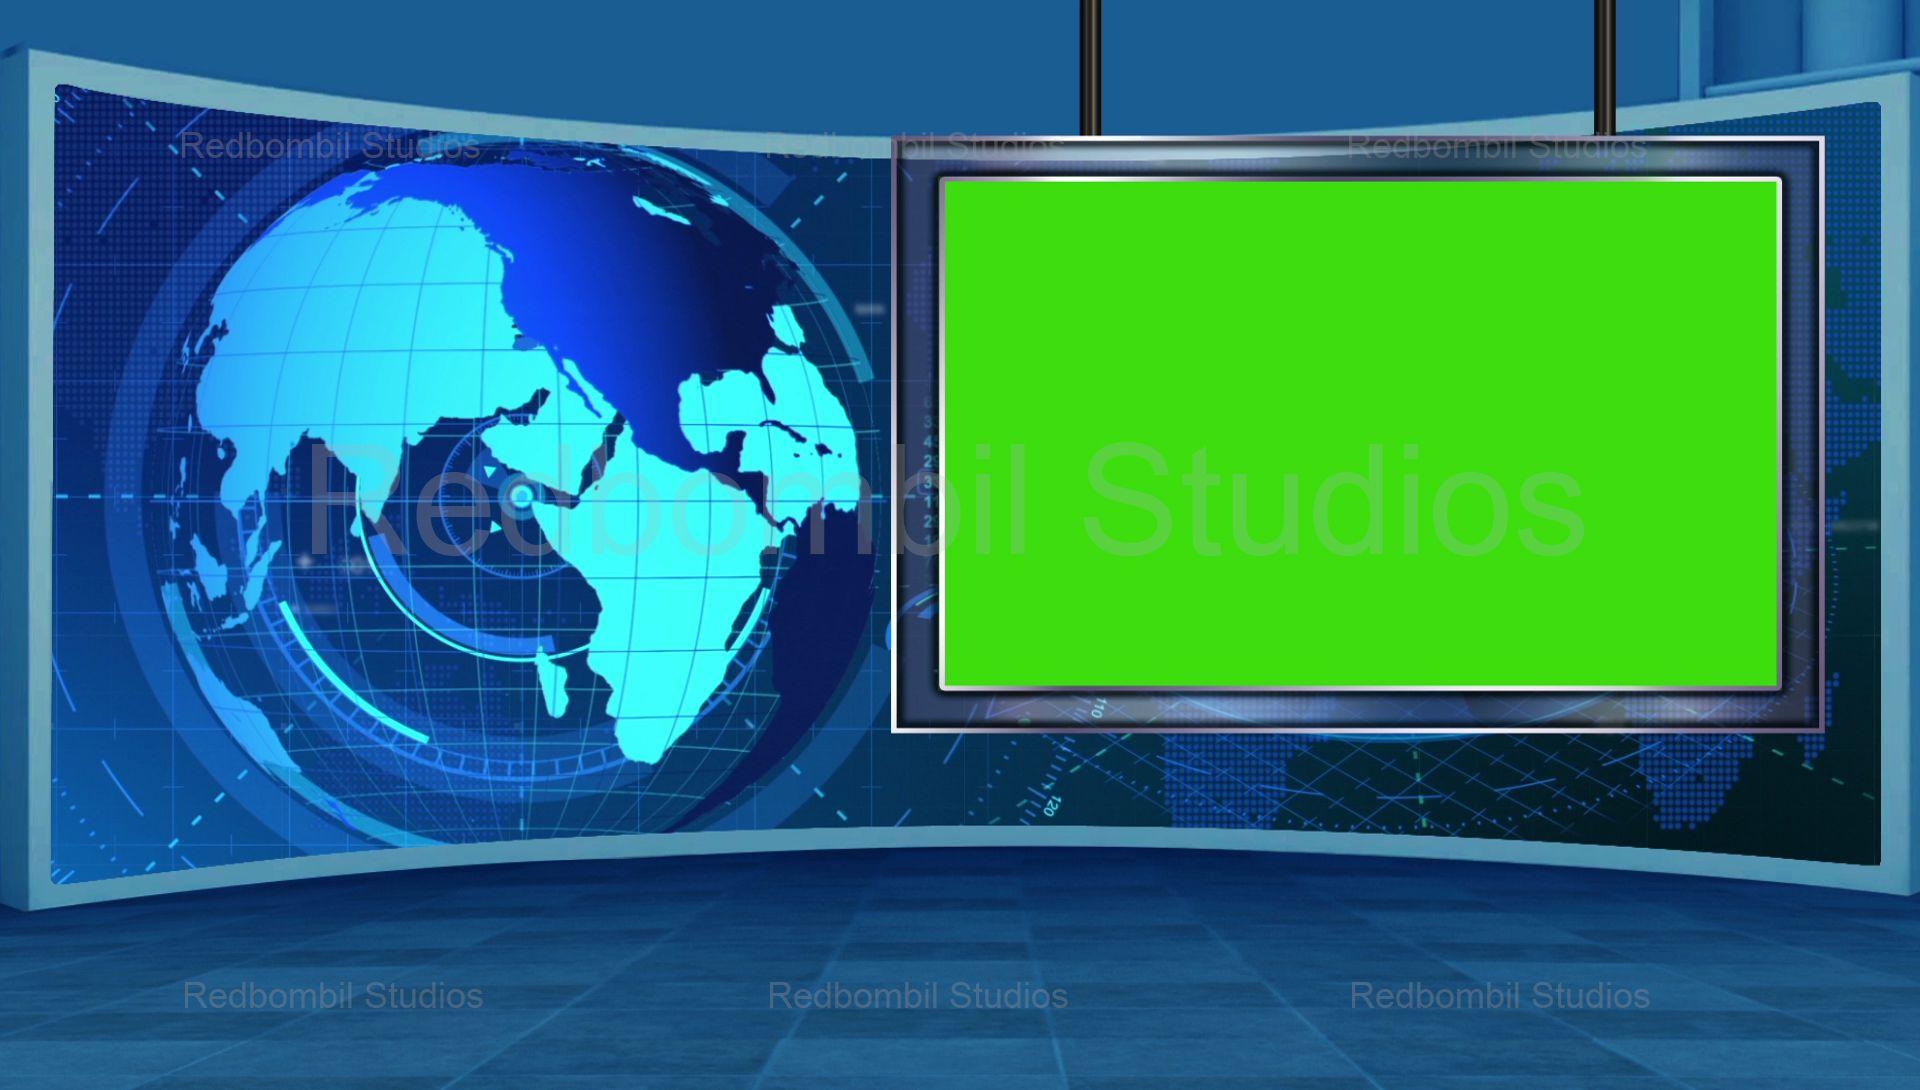 News 16 Broadcast Tv Studio Green Screen Background Loopable Green Screen Backgrounds Greenscreen Free Green Screen